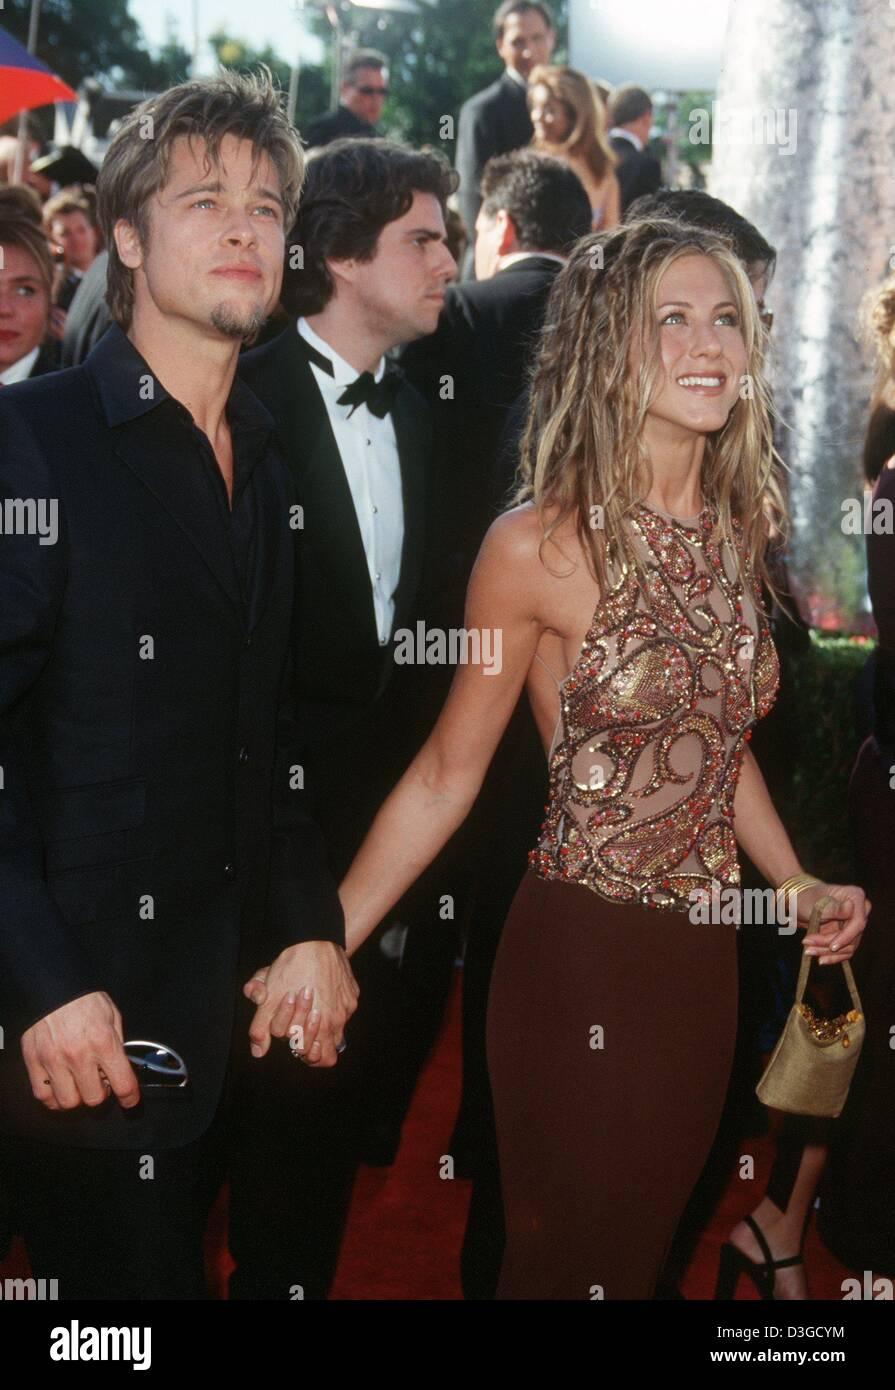 dpa-files-hollywood-hunk-brad-pitt-and-his-fiancee-jennifer-aniston-arrive-to